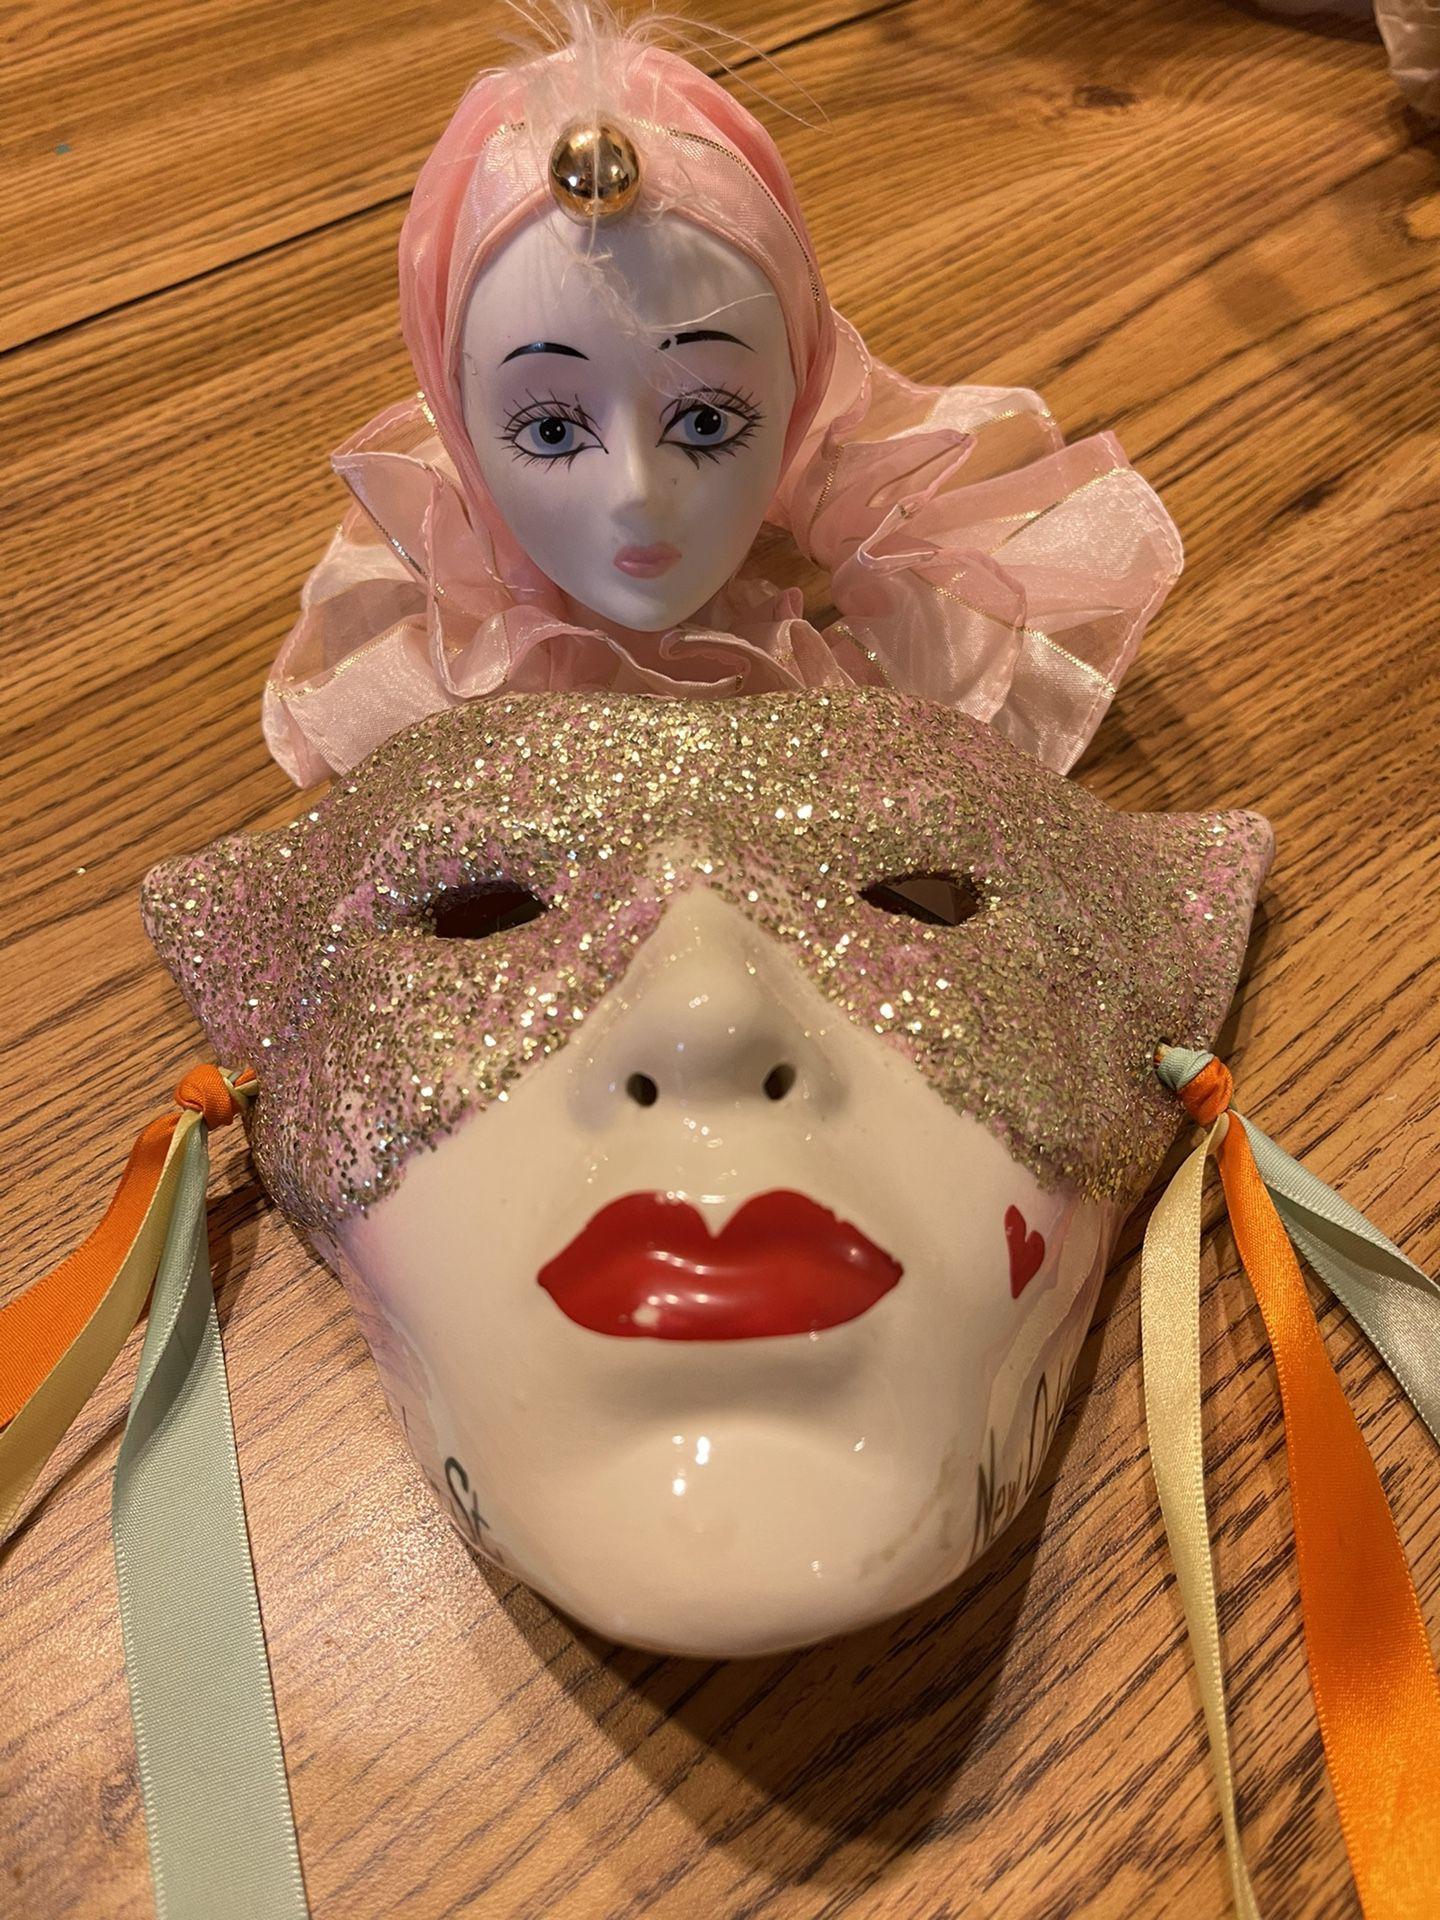 Mardi Gras Ceramic Mask And Figurine